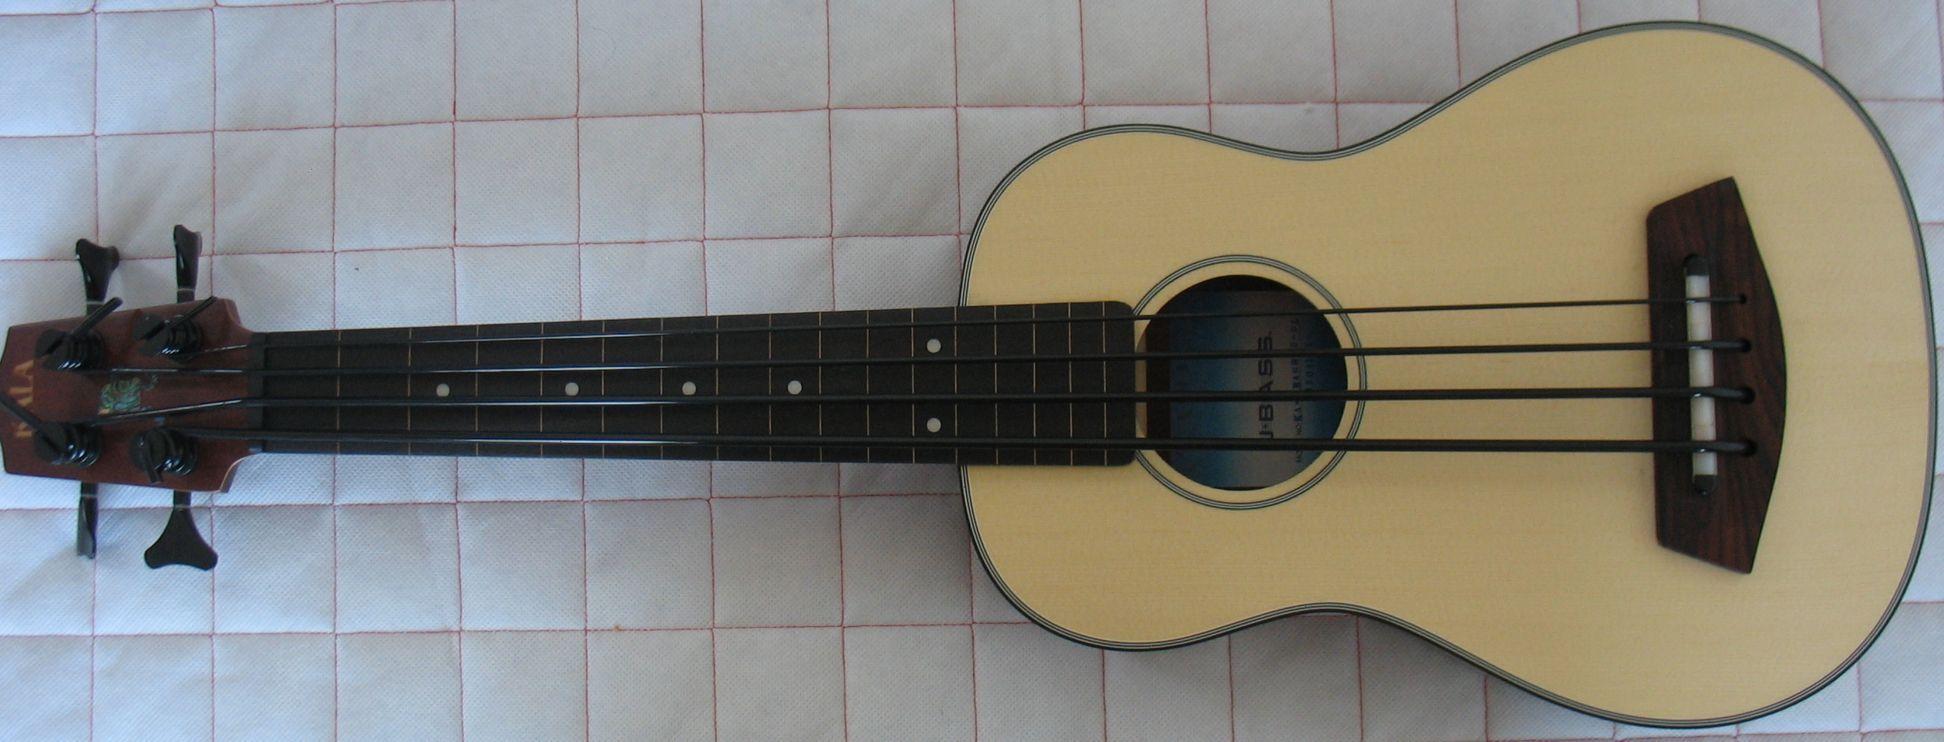 how to play bass ukulele